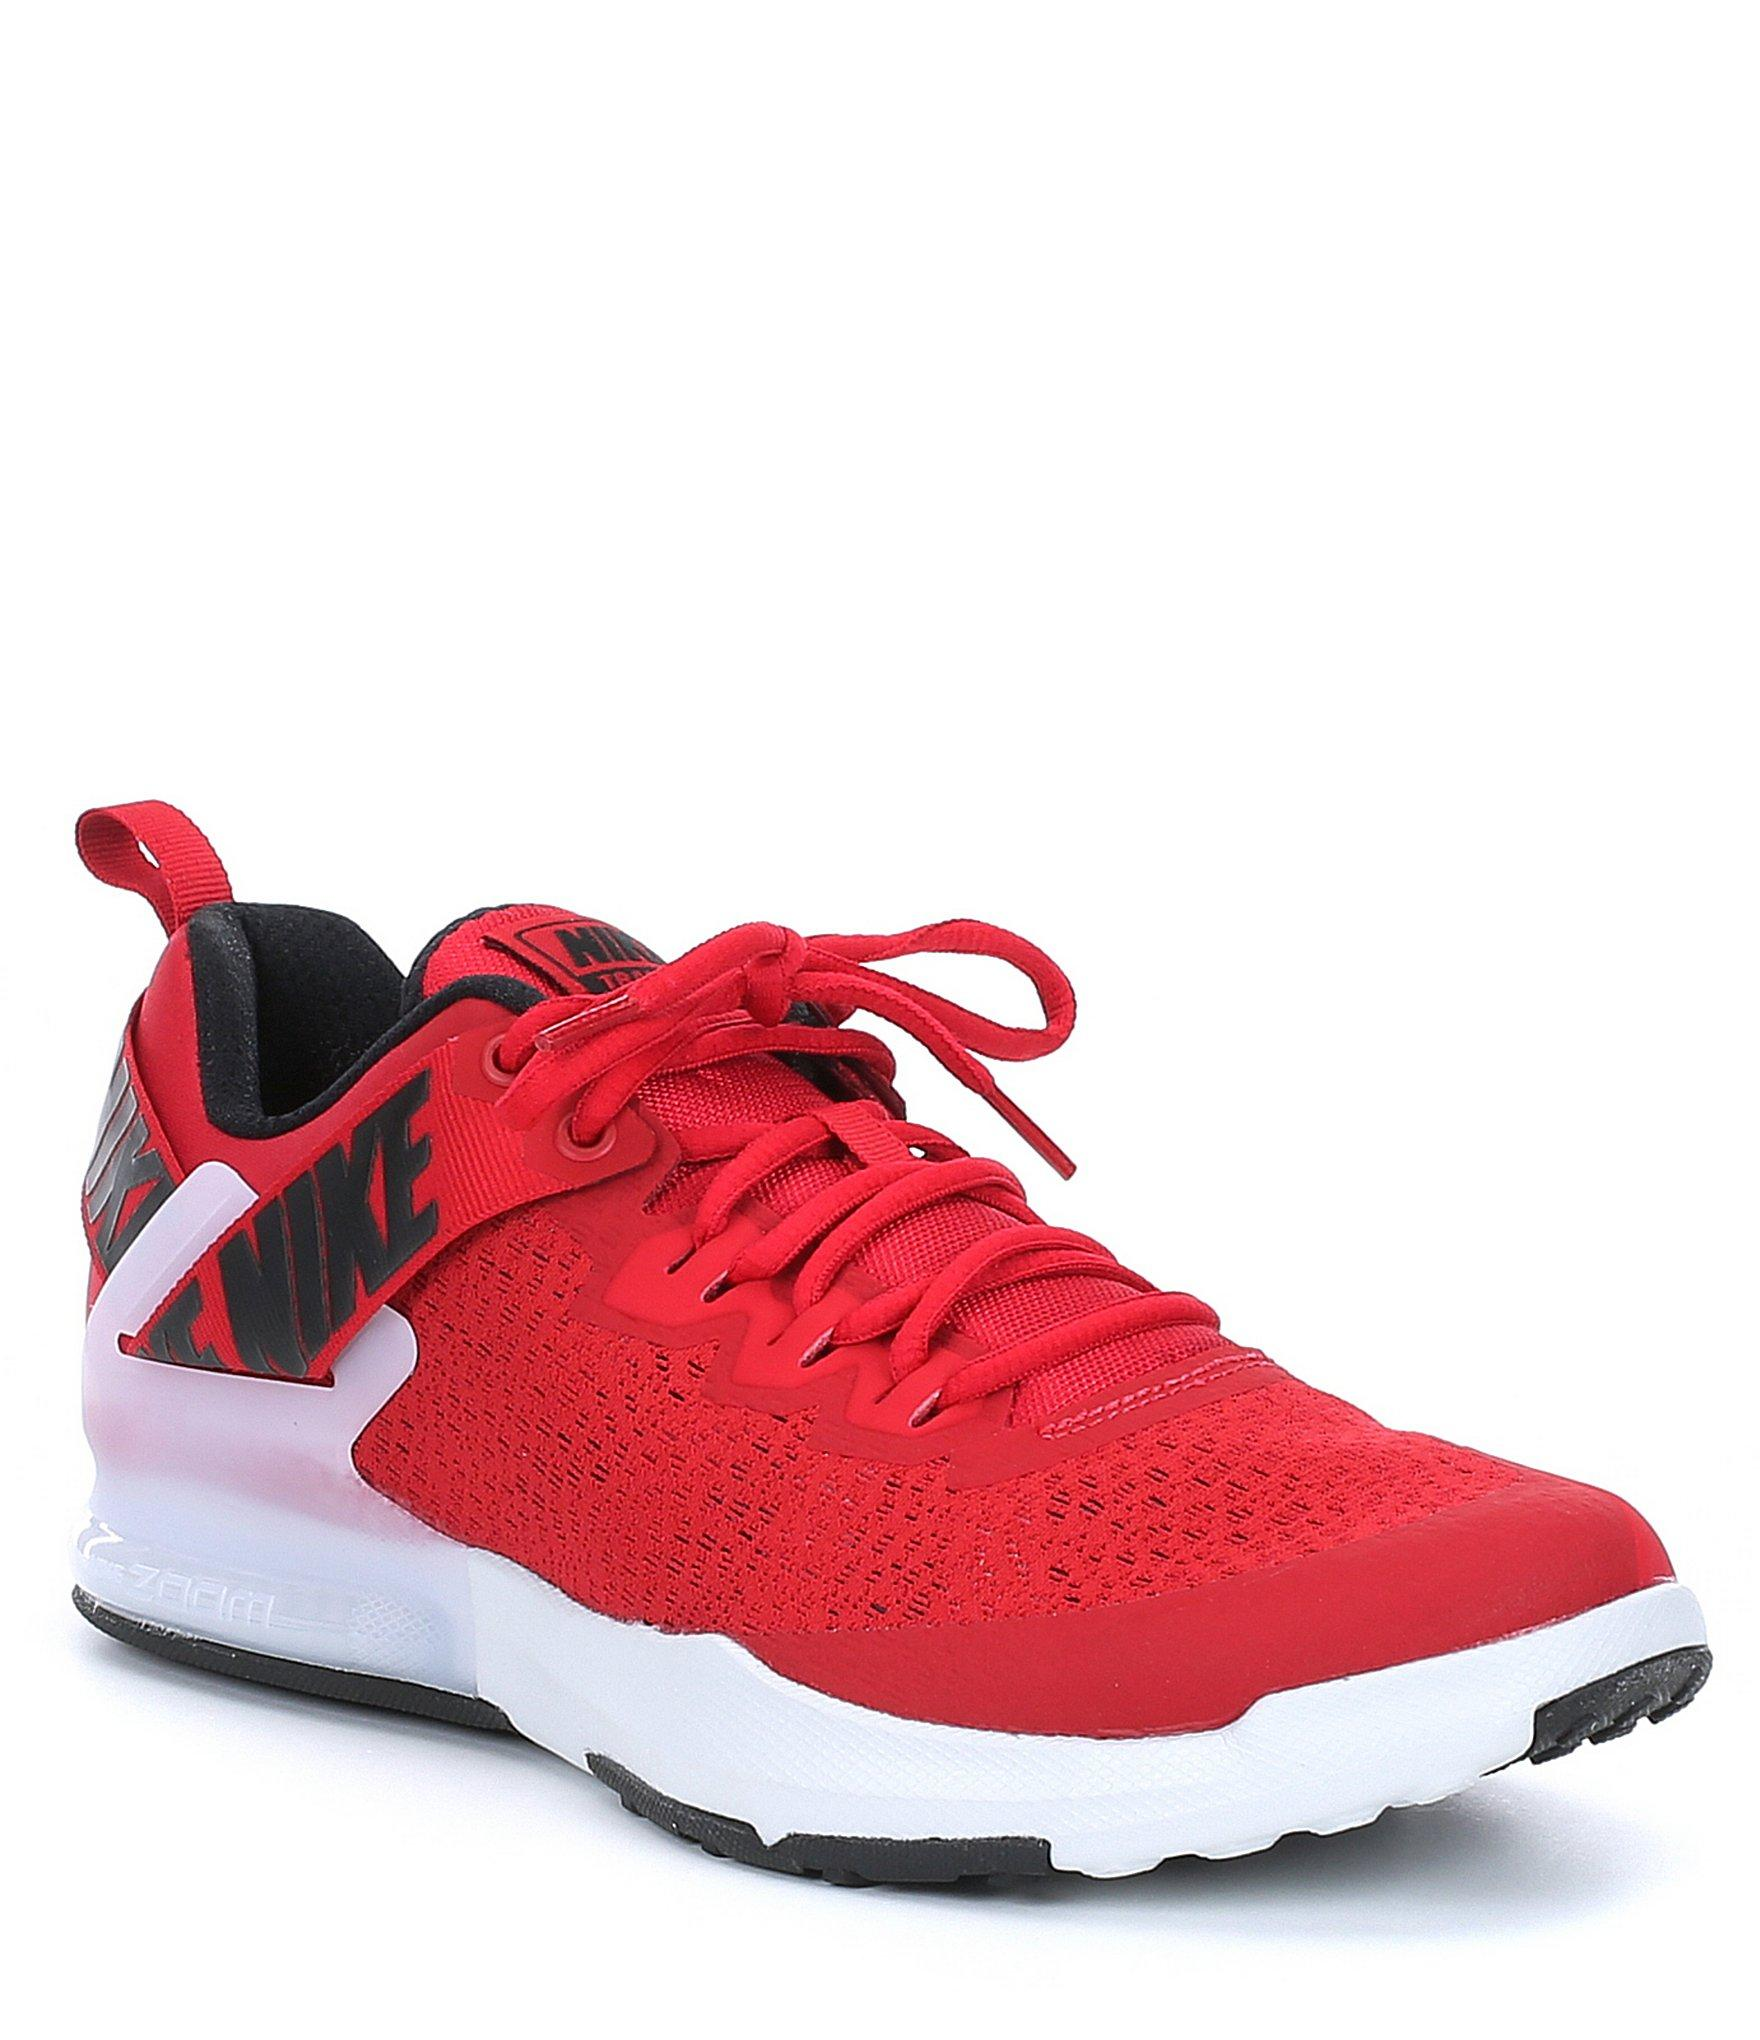 3e012eae0599 Nike Men s Zoom Domination Tr 2 Training Shoe in Red for Men - Lyst